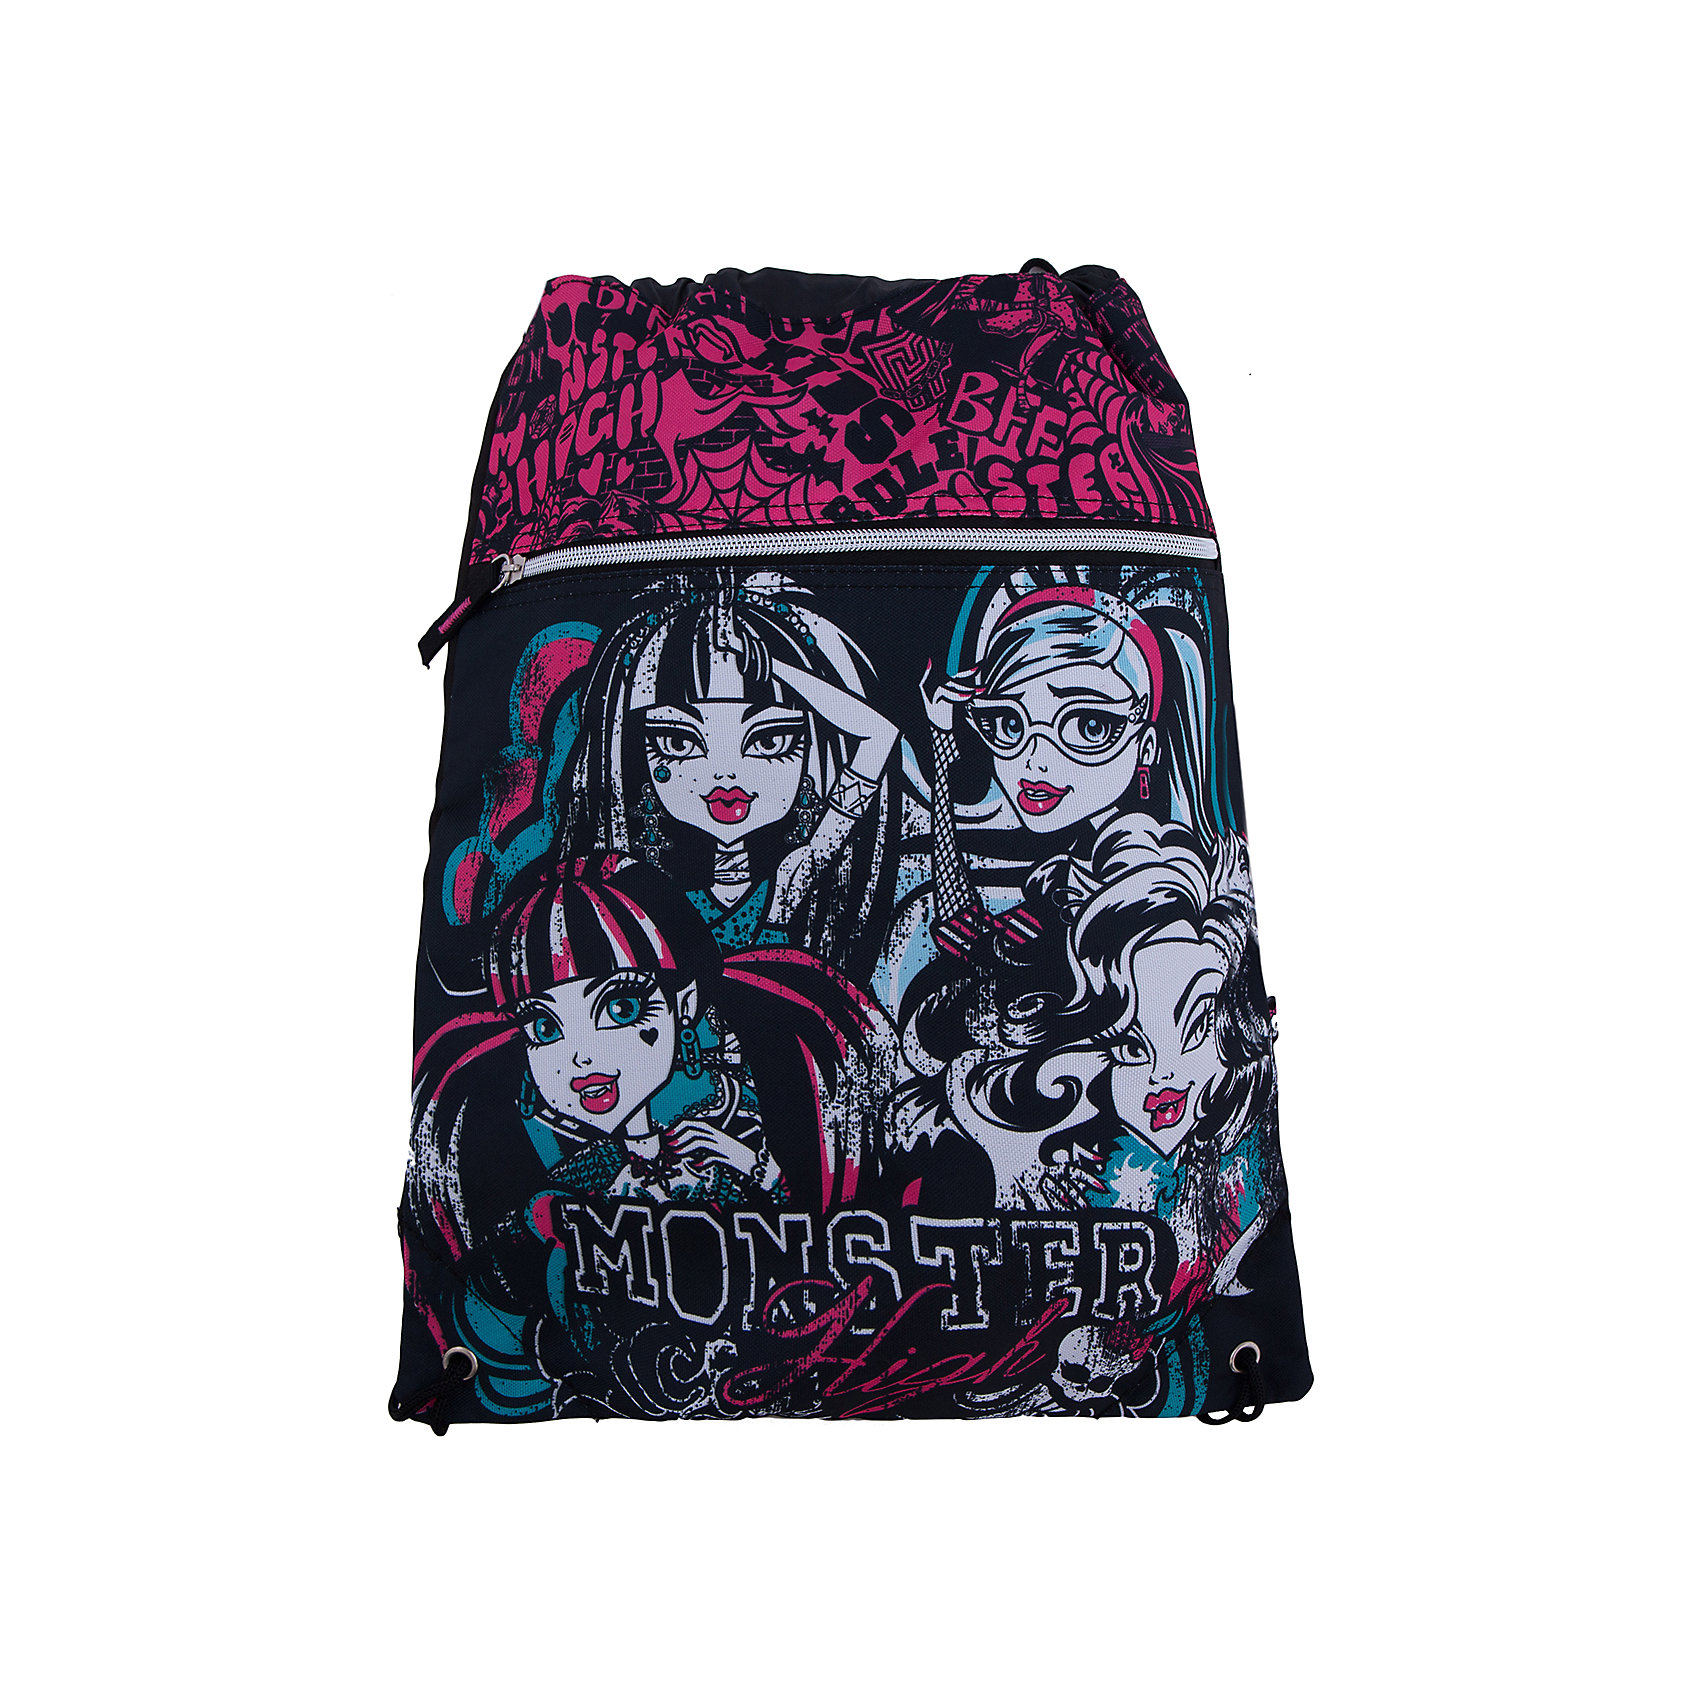 Академия групп Сумка-рюкзак для обуви, Monster High мешок для обуви академия групп transformers 43 34см trbb ut1 883